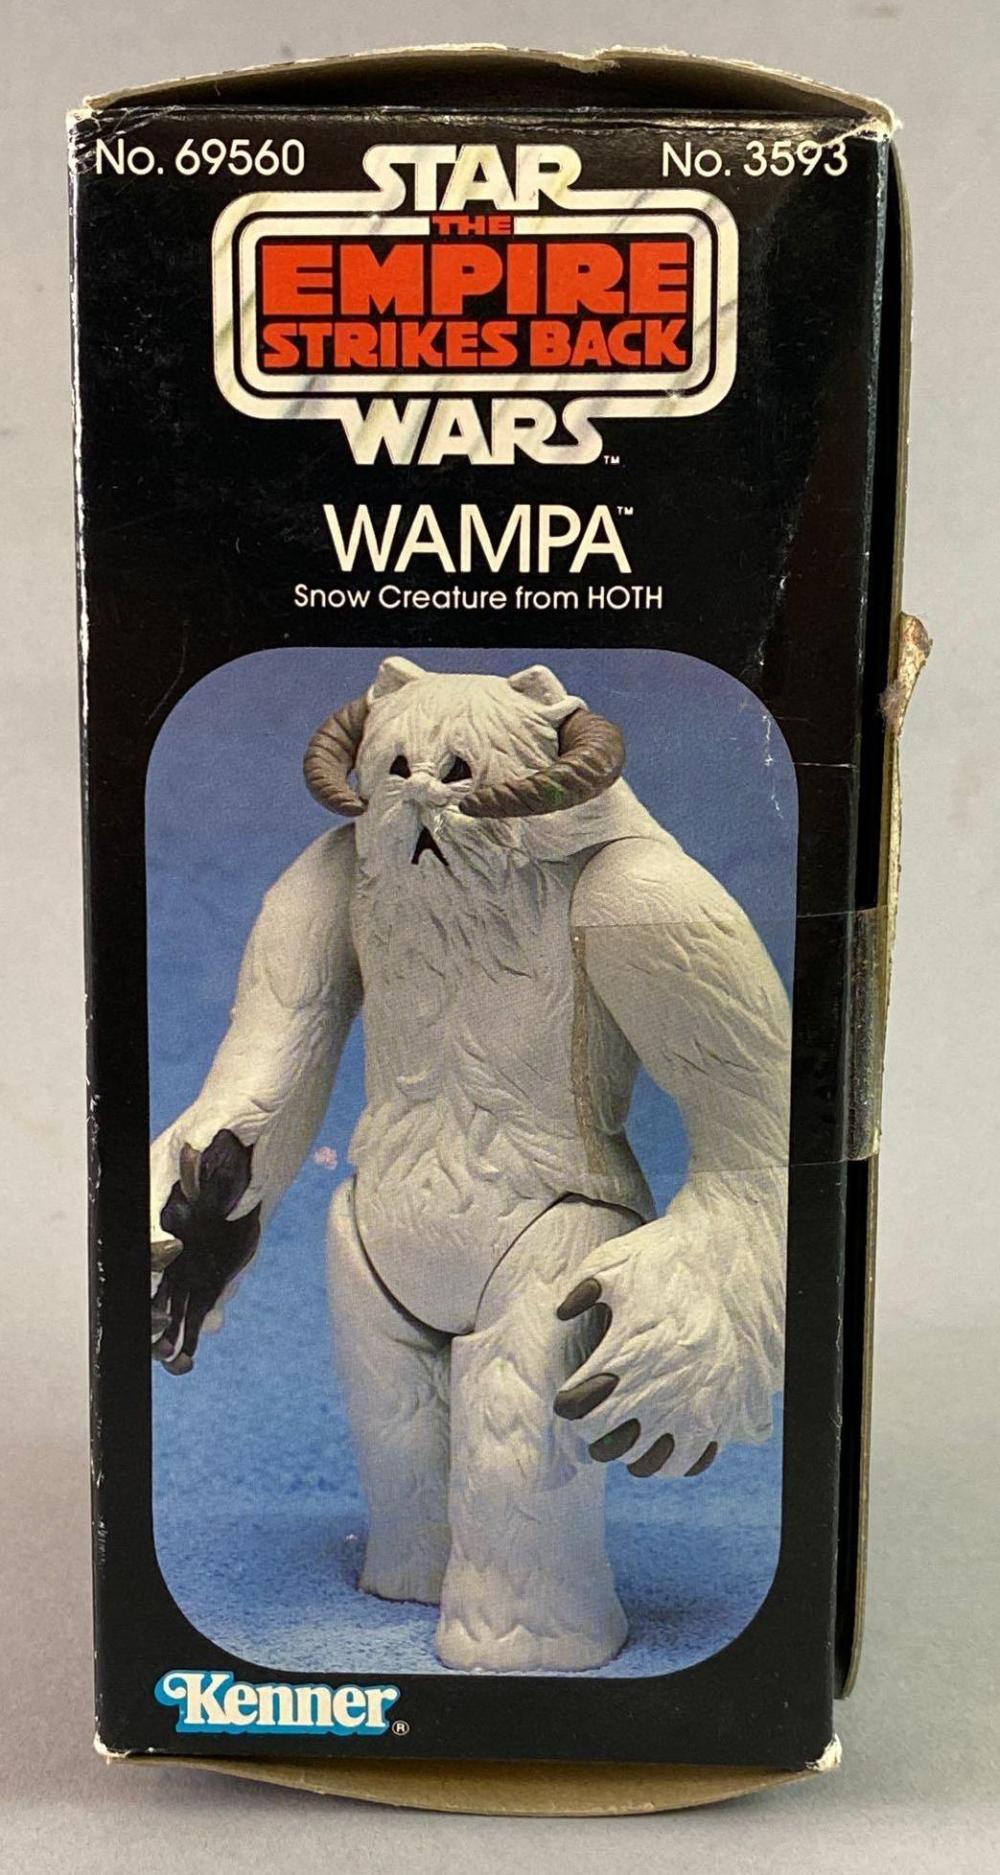 1981 Kenner Star Wars ESB Wampa NIB Action Figure.